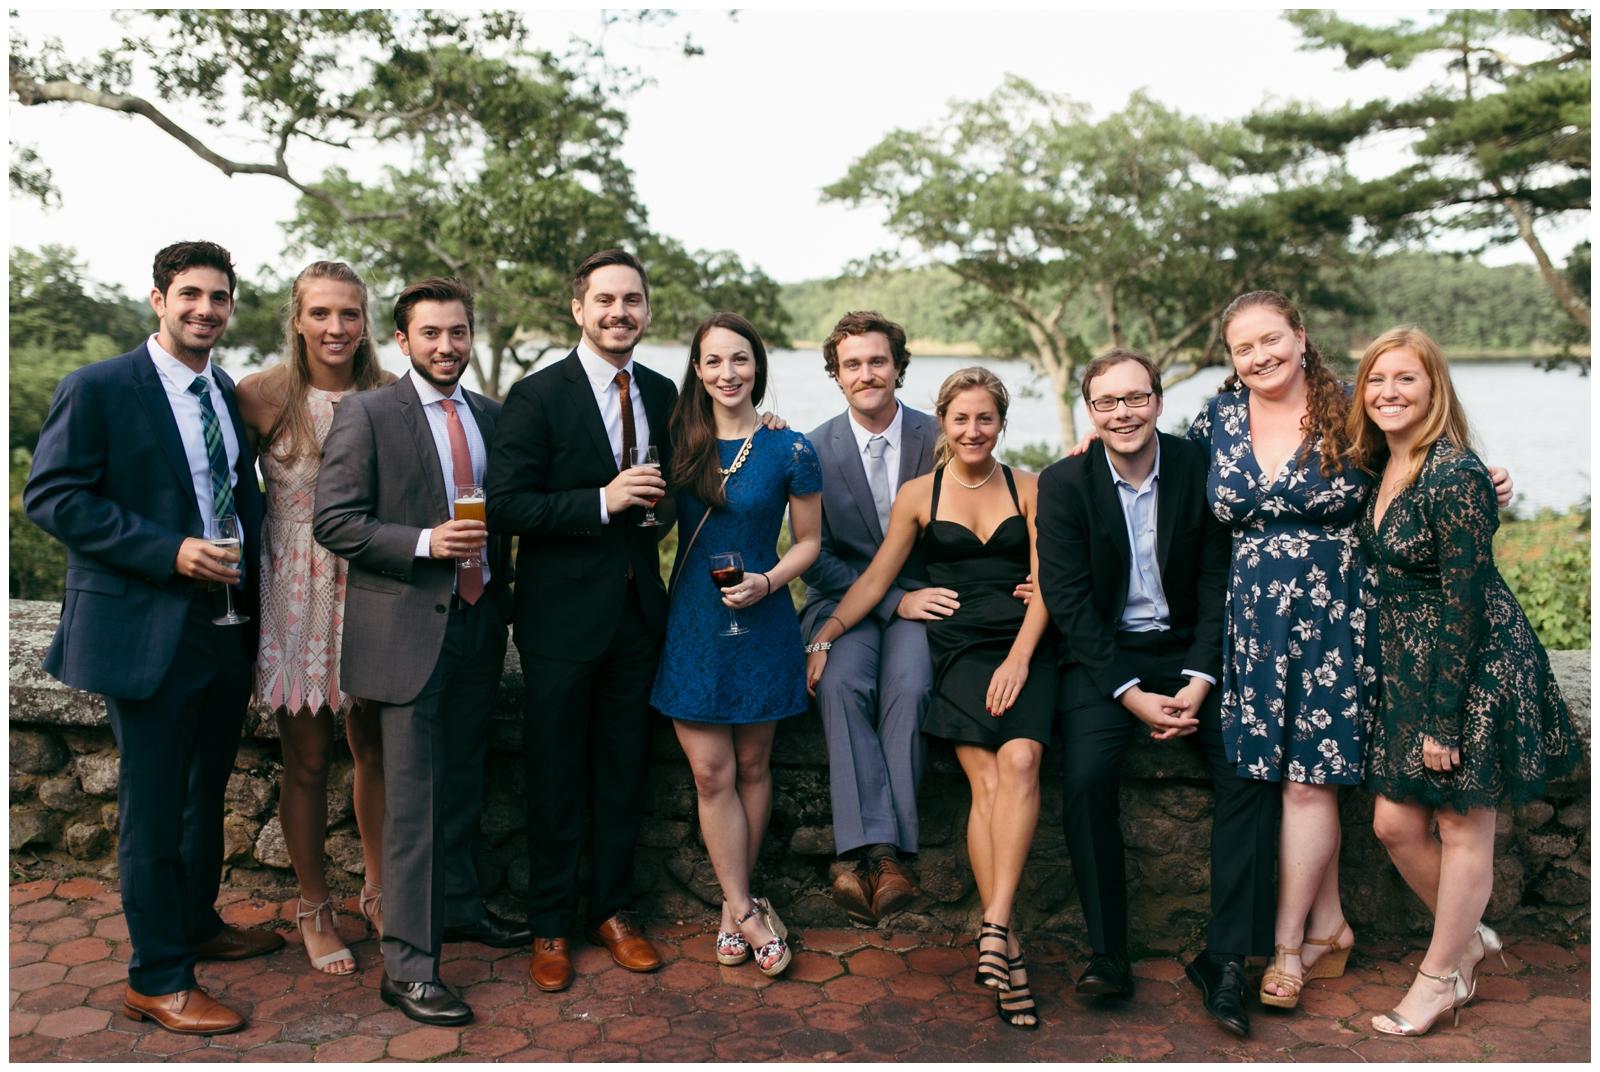 Moraine-Farm-wedding-Bailey-Q-Photo-Massachusetts-wedding-photpgrapher-091.jpg